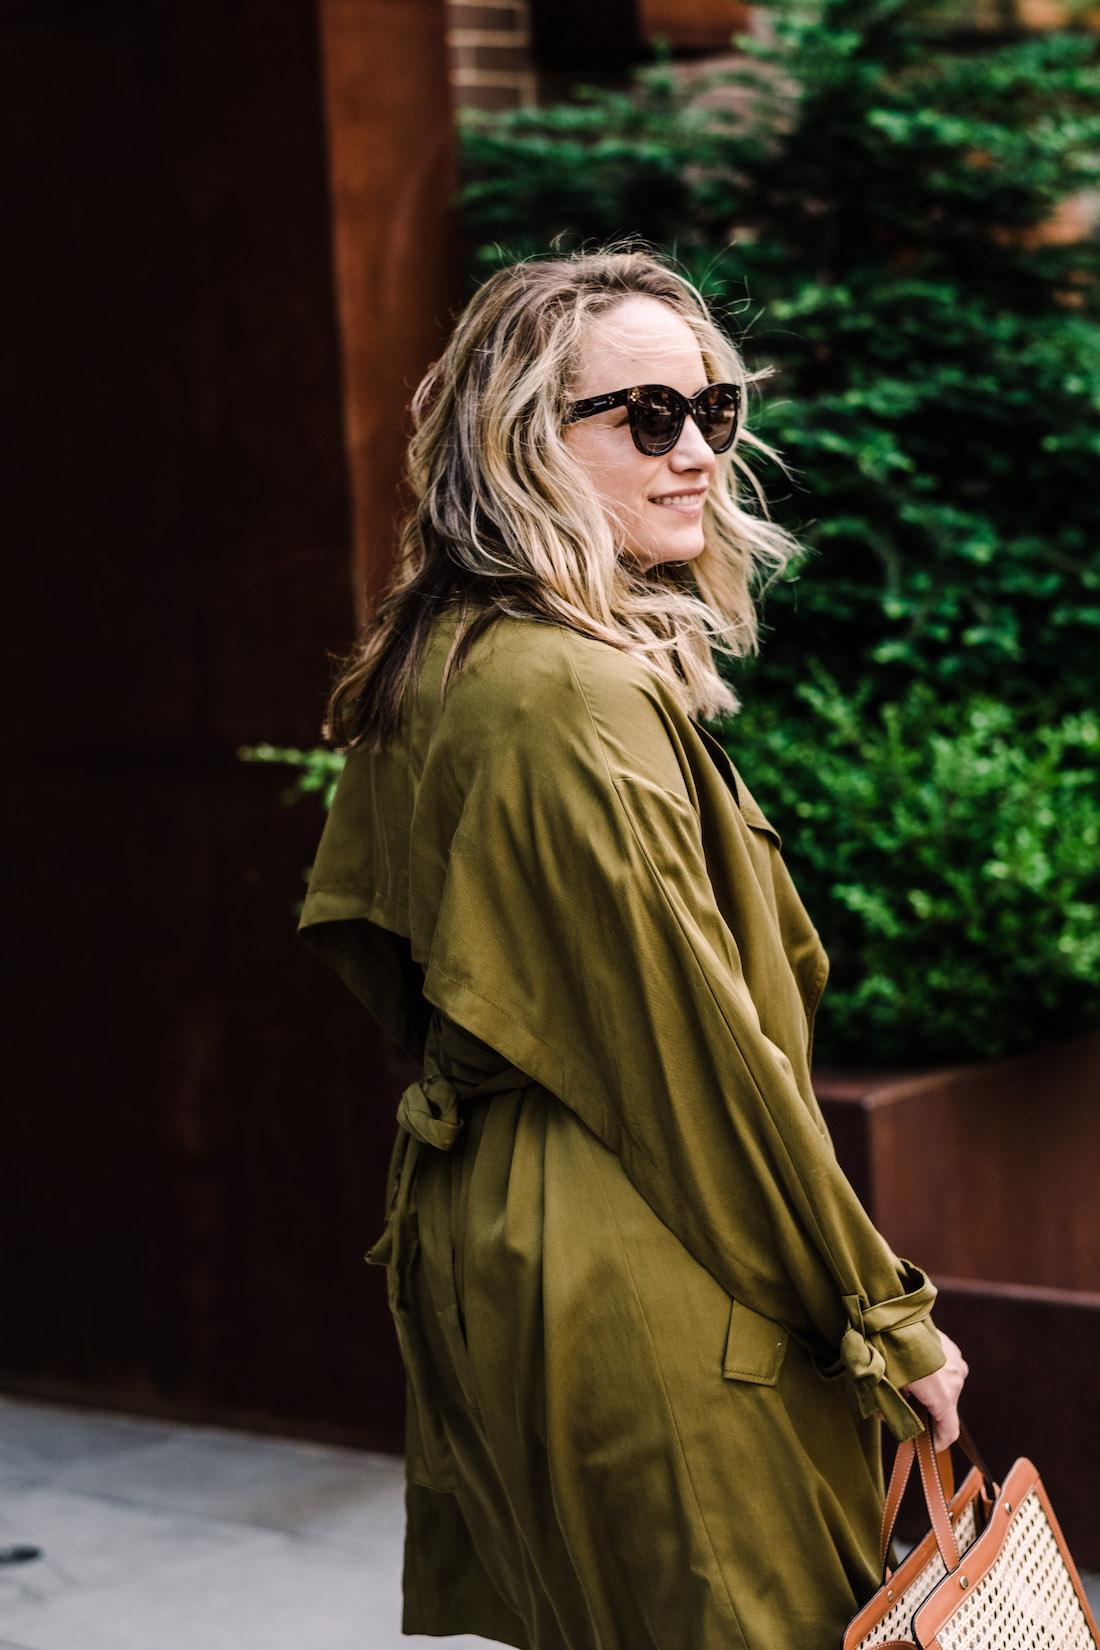 The Stripe -Topshop Jacket // Palmgrens Bag // Polaroid Sunglasses